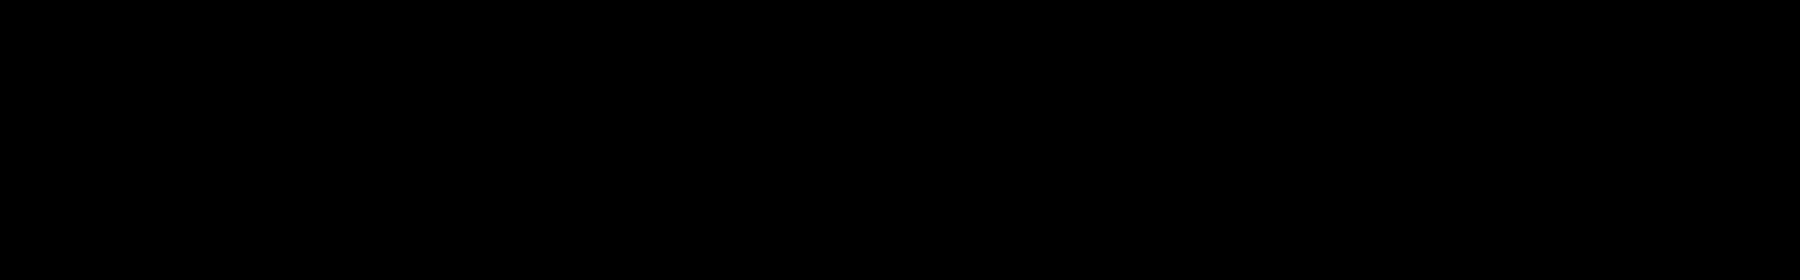 Rythm Percs audio waveform